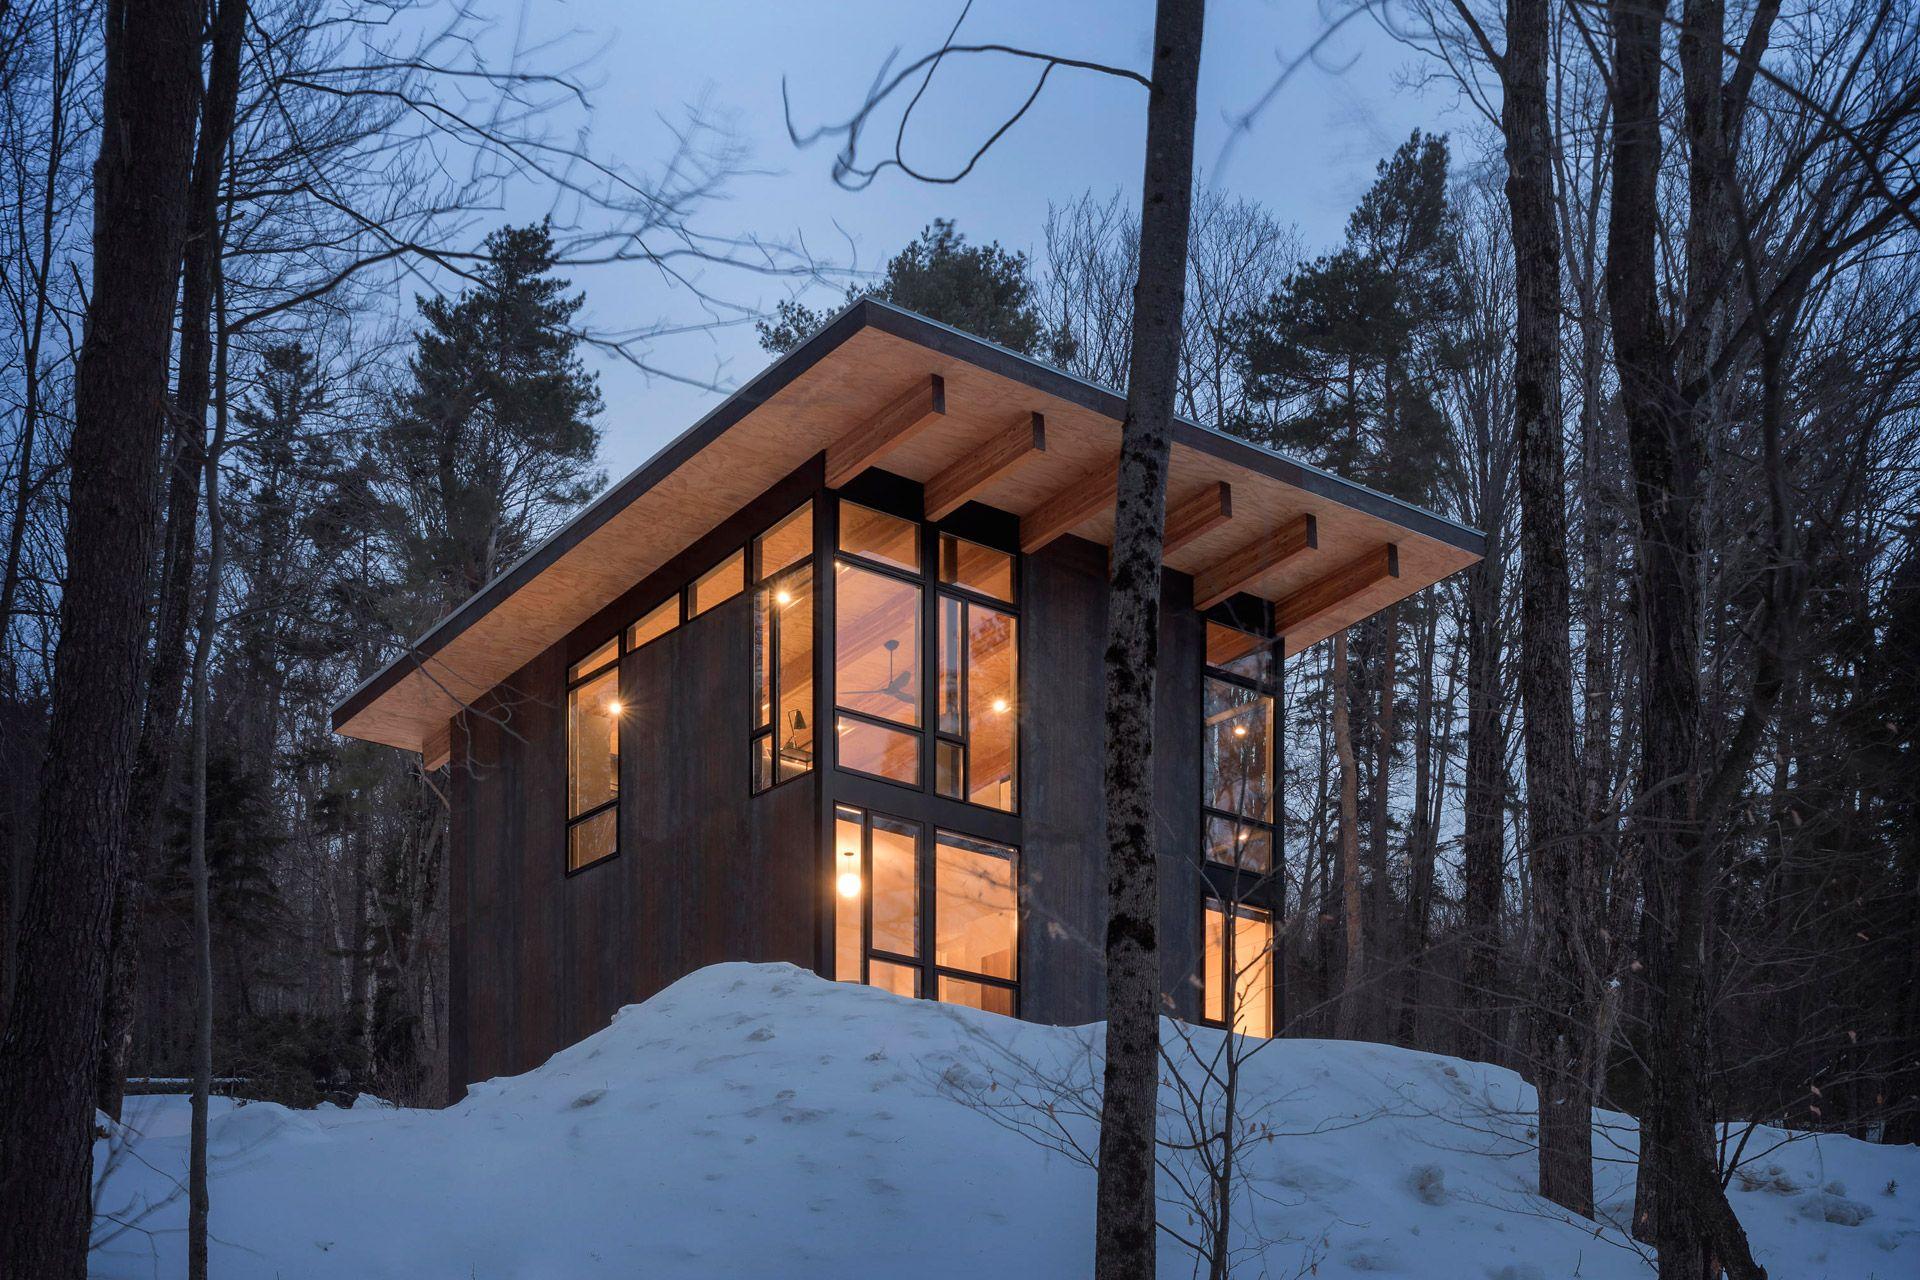 Vermont Cabin In 2020 Cabin Architecture Vermont